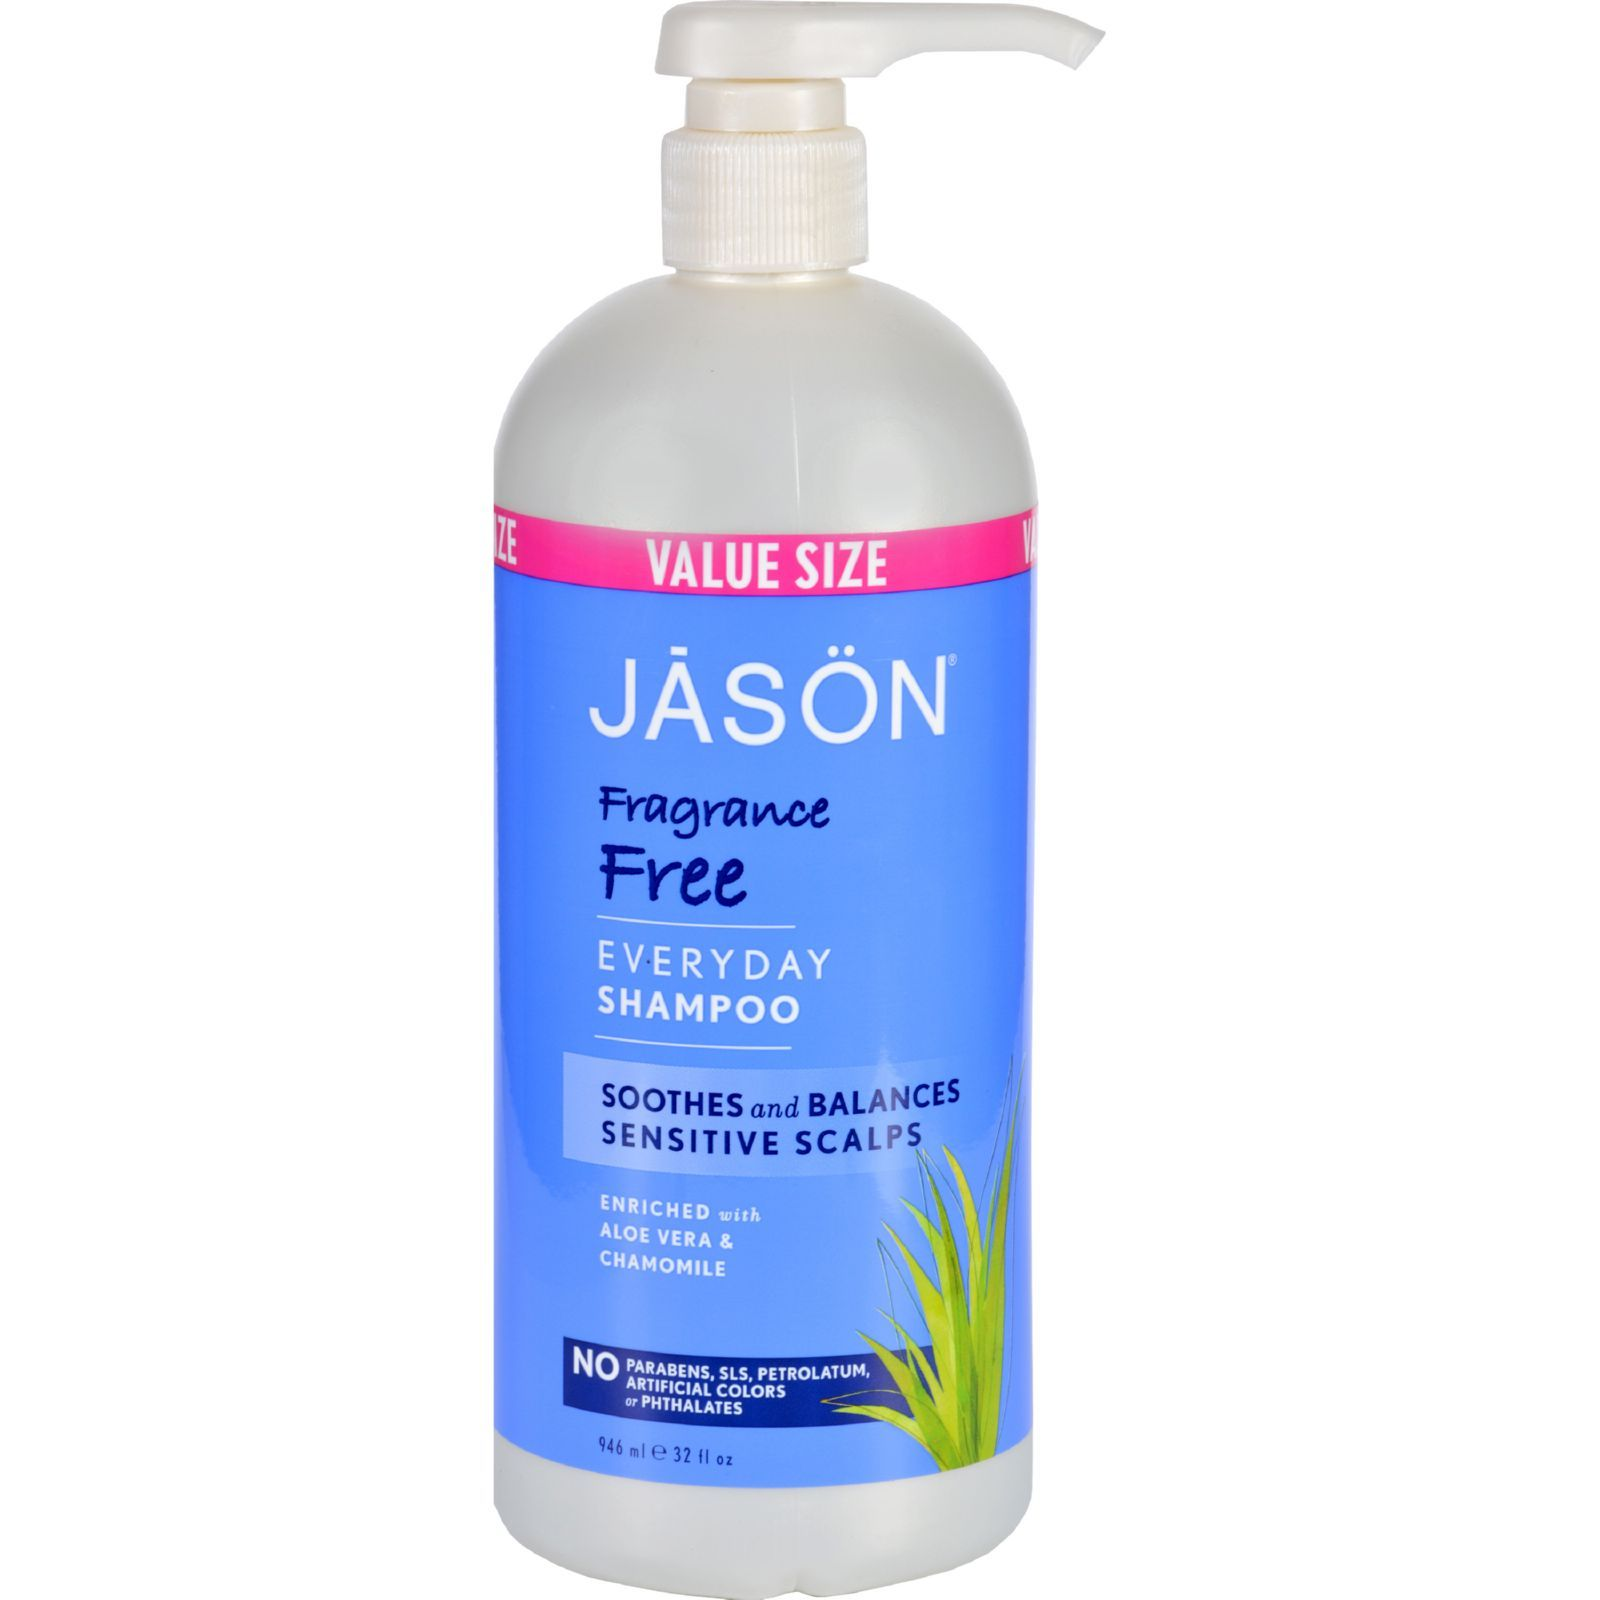 Jason Natural Products Shampoo For Sensitive Scalp Fragrance Free 32 Oz Trivoshop In 2021 Fragrance Free Products Fragrance Free Shampoo Natural Shampoo